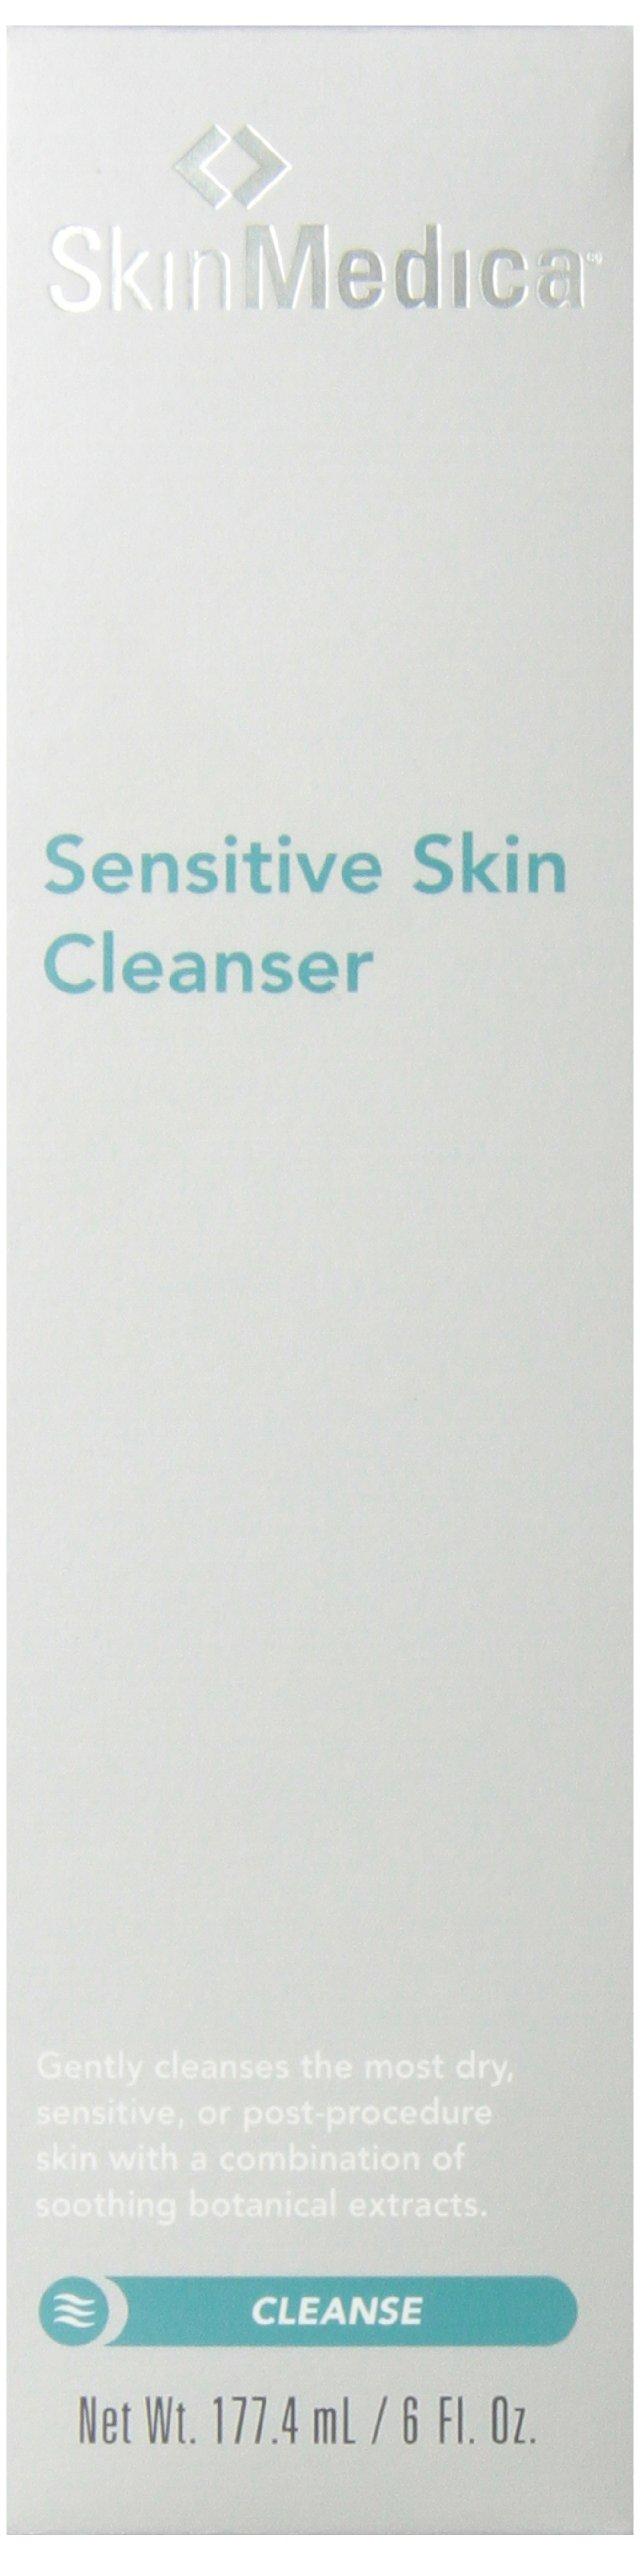 SkinMedica Sensitive Skin Cleanser